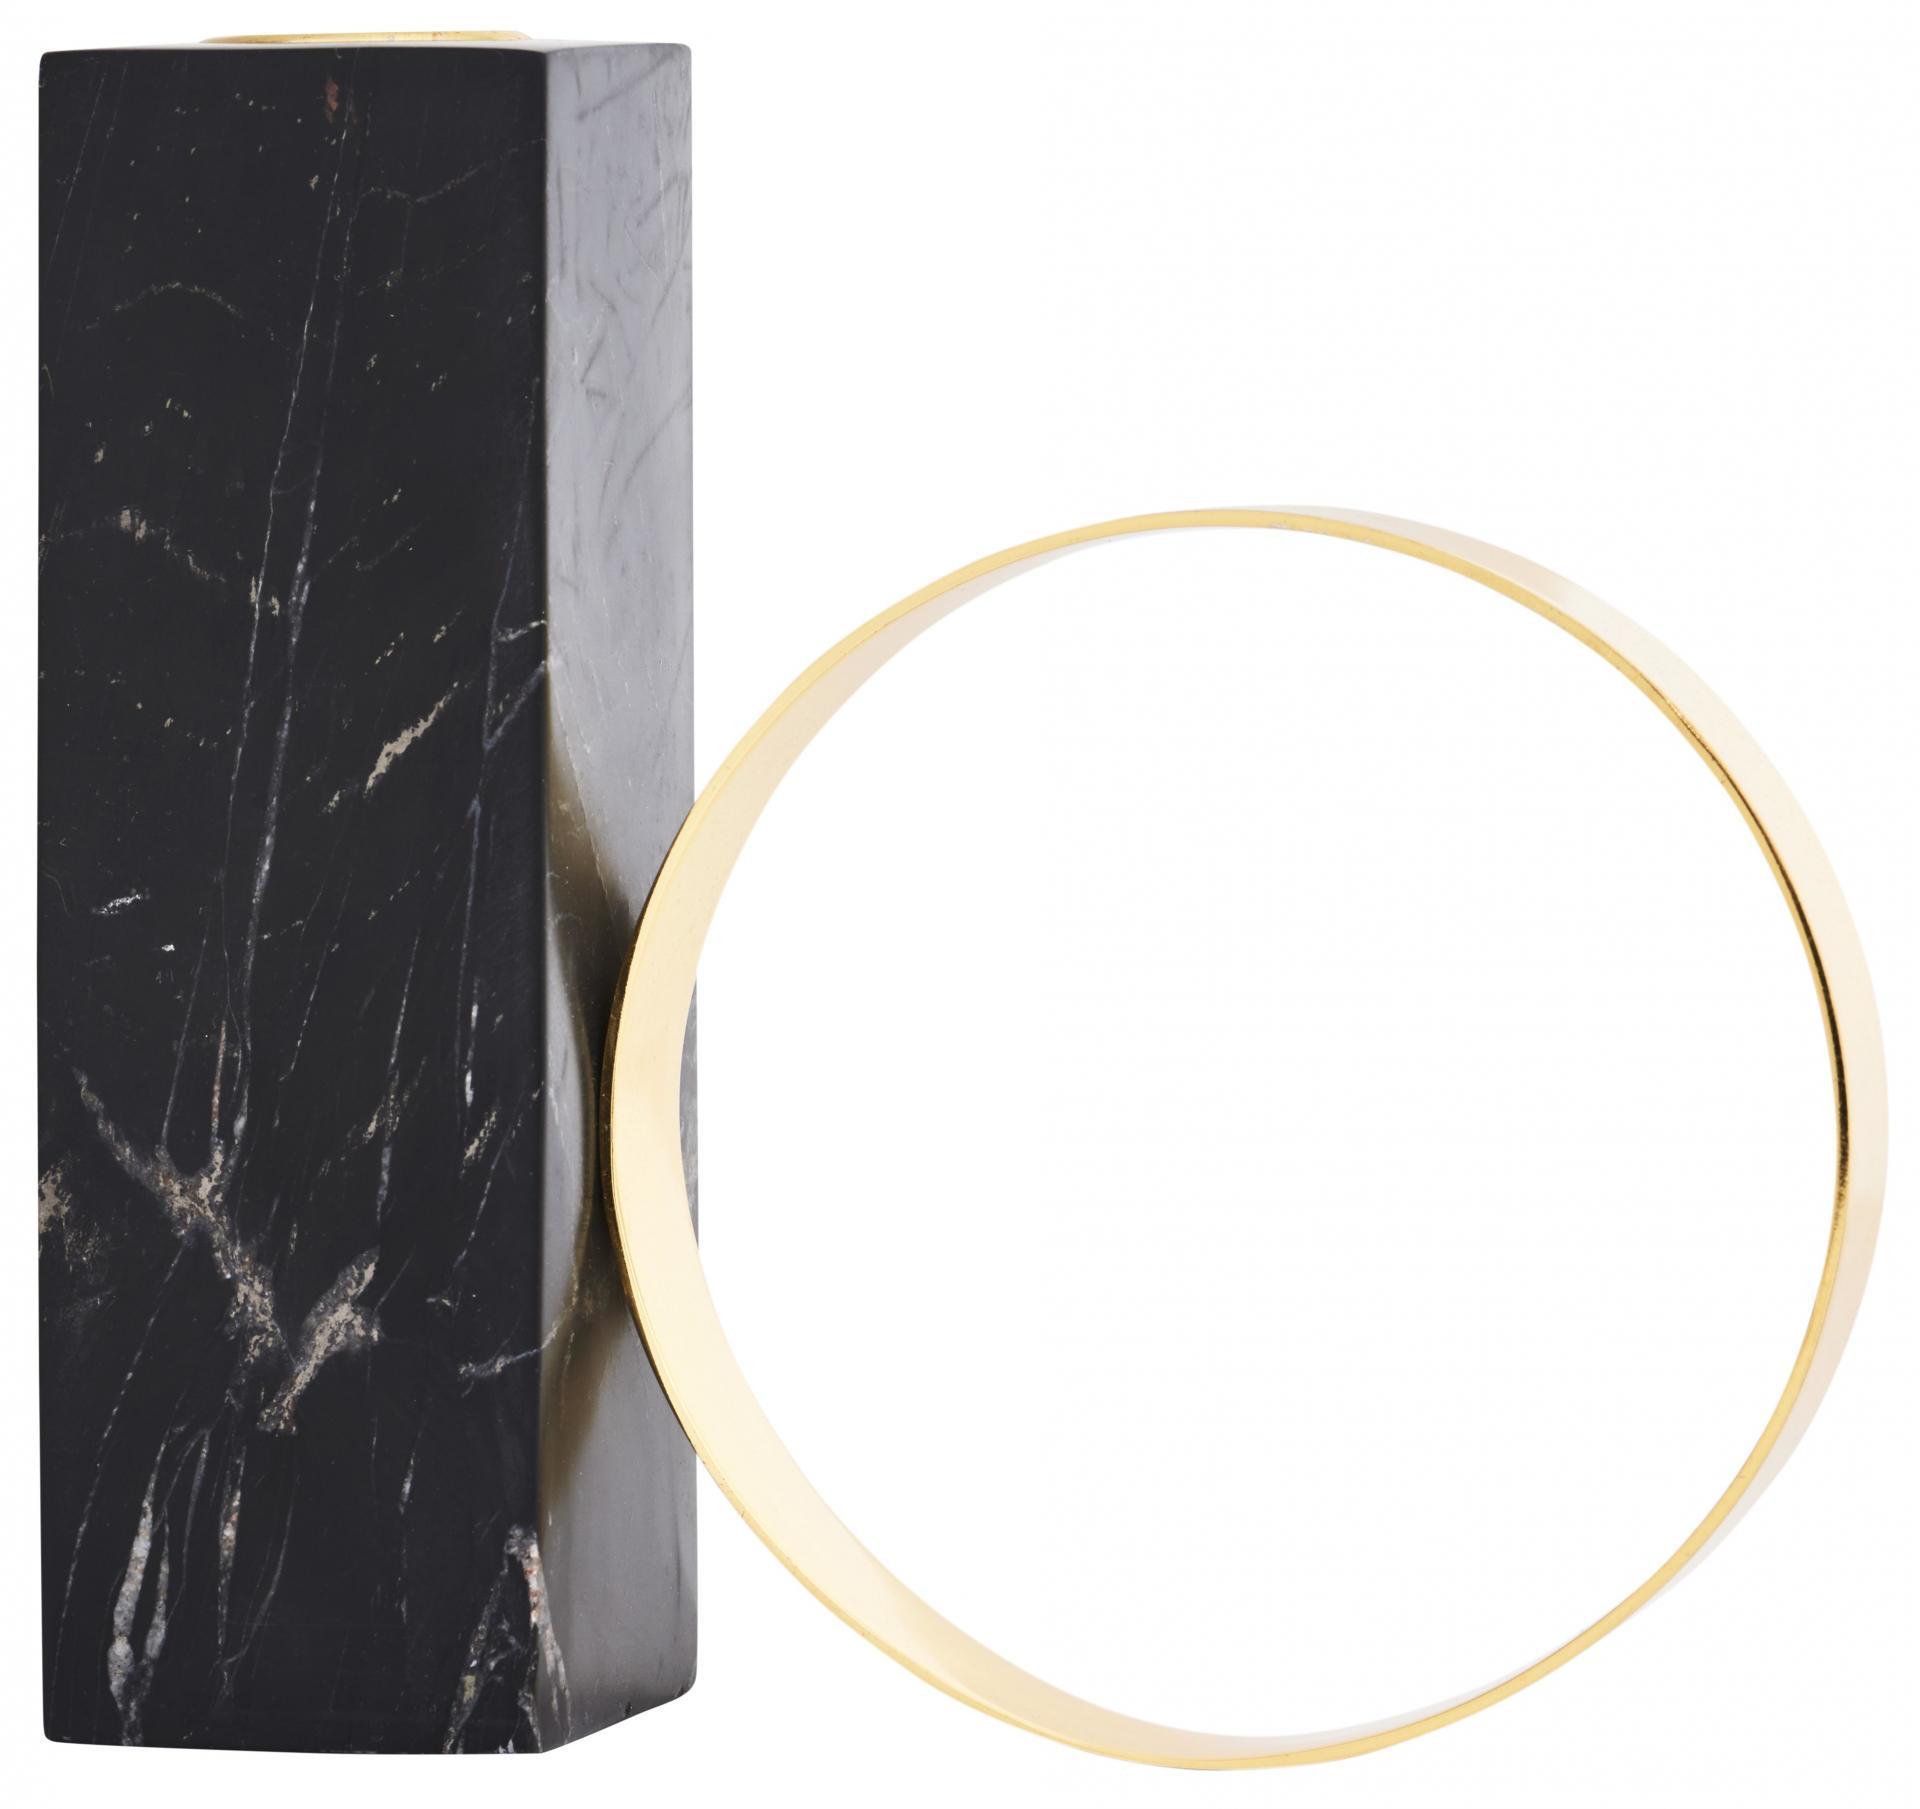 OYOY Designový svícen Black Marble & Brass, černá barva, zlatá barva, kov, mramor